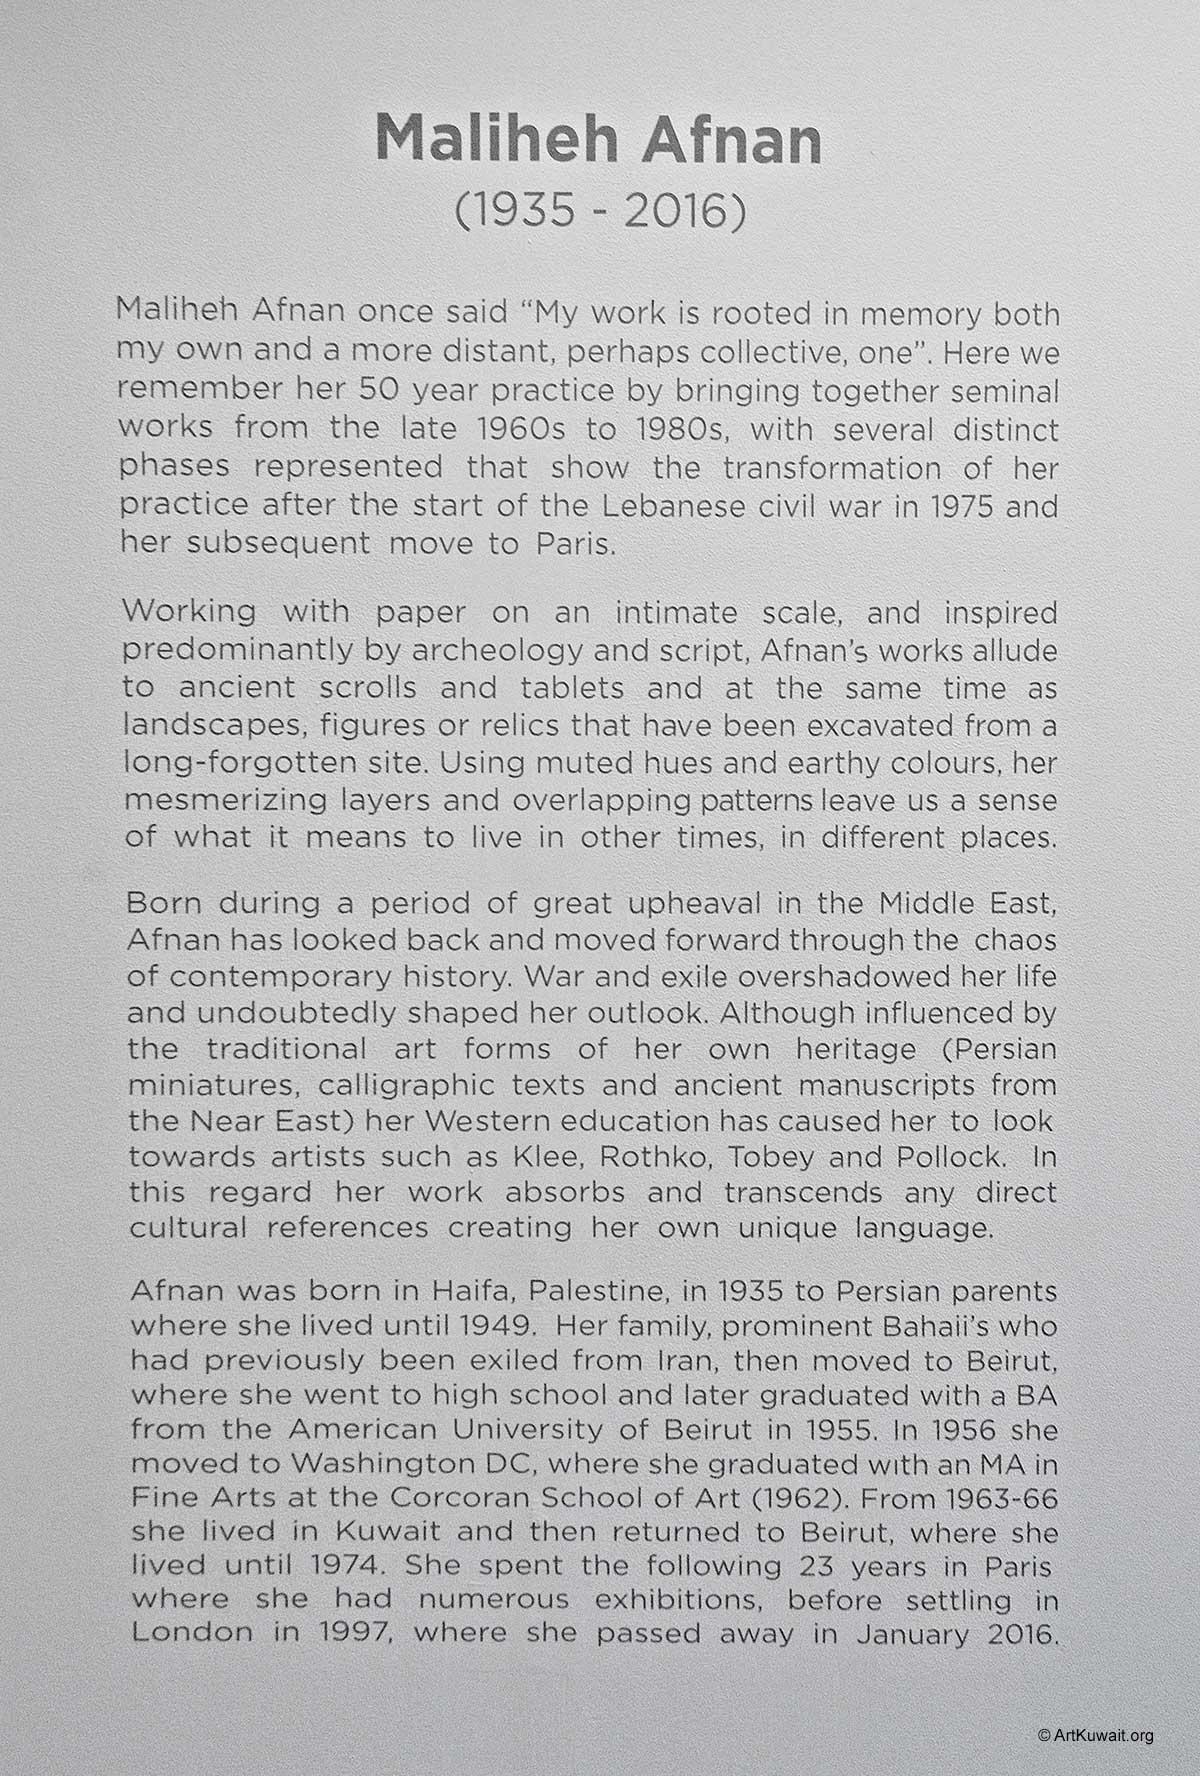 Art Dubai Modern 2016 - Maliheh Afnan